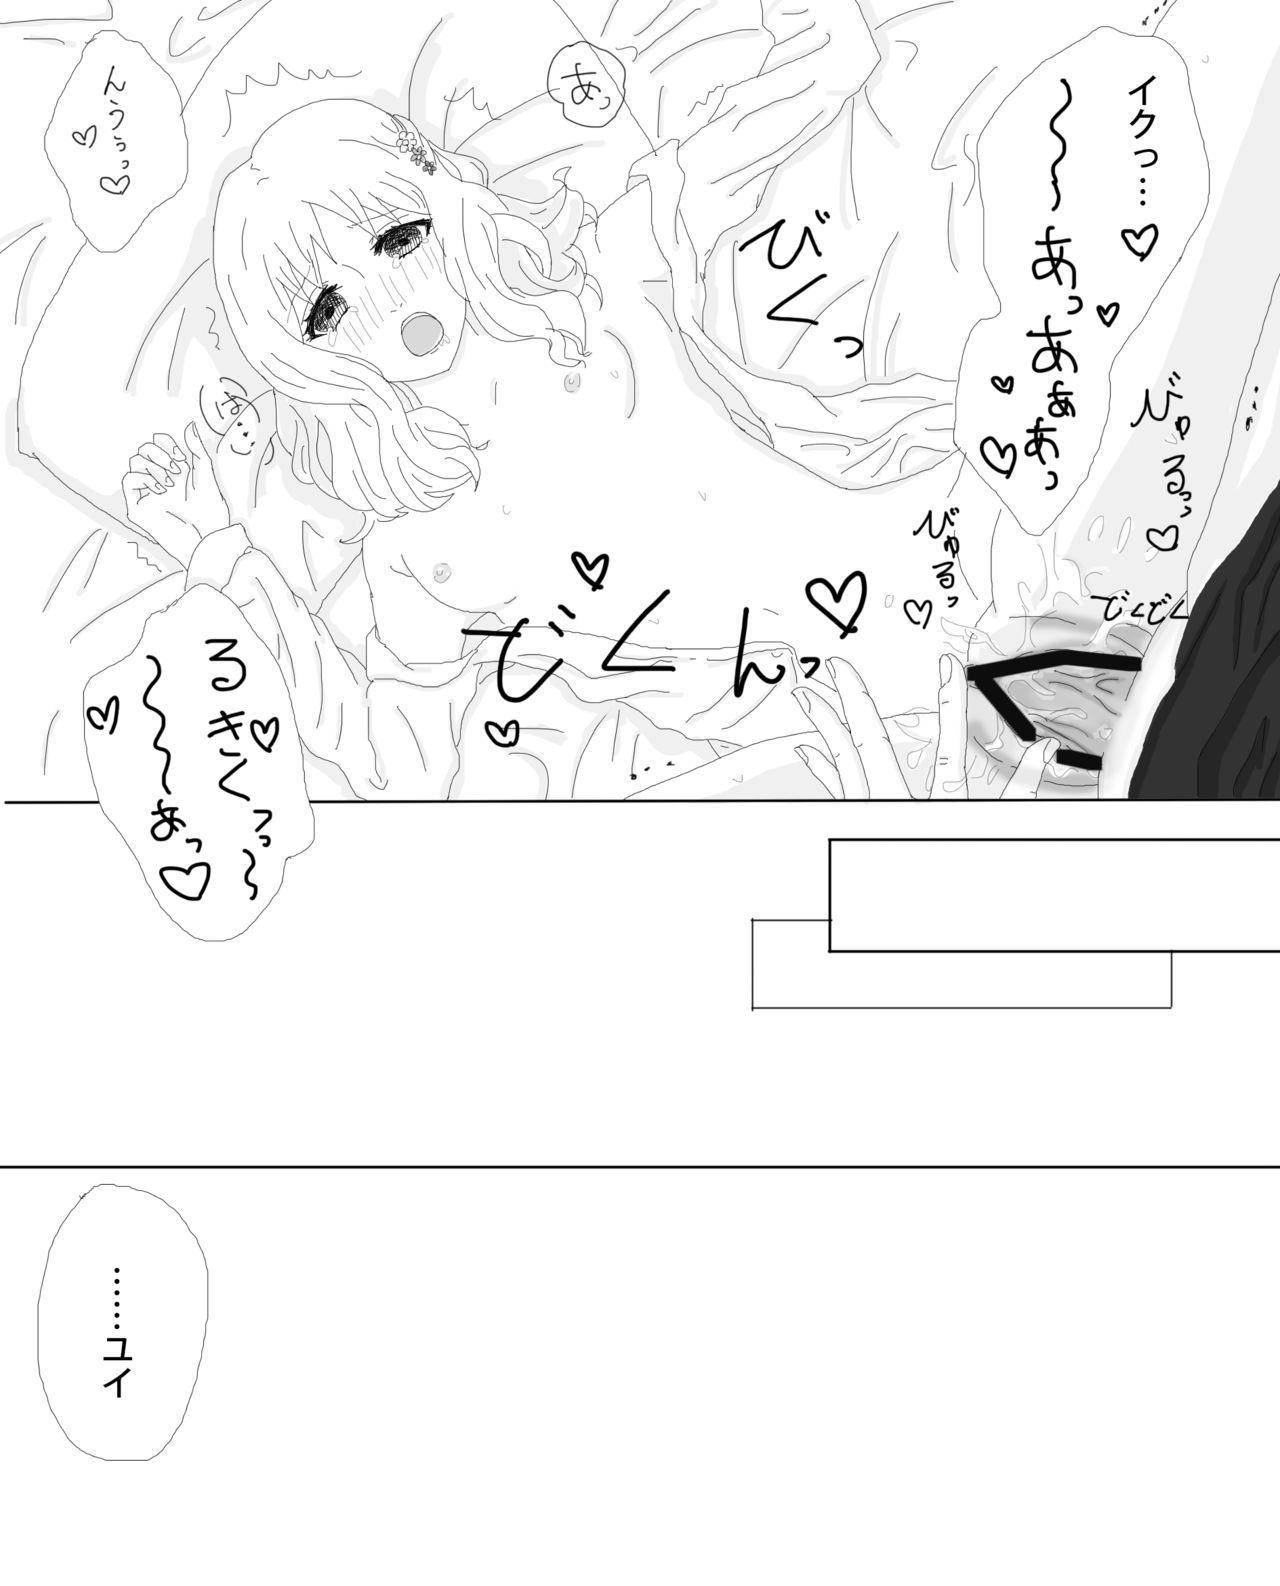 Rukiyui-chan no wo Midarana Manga 5